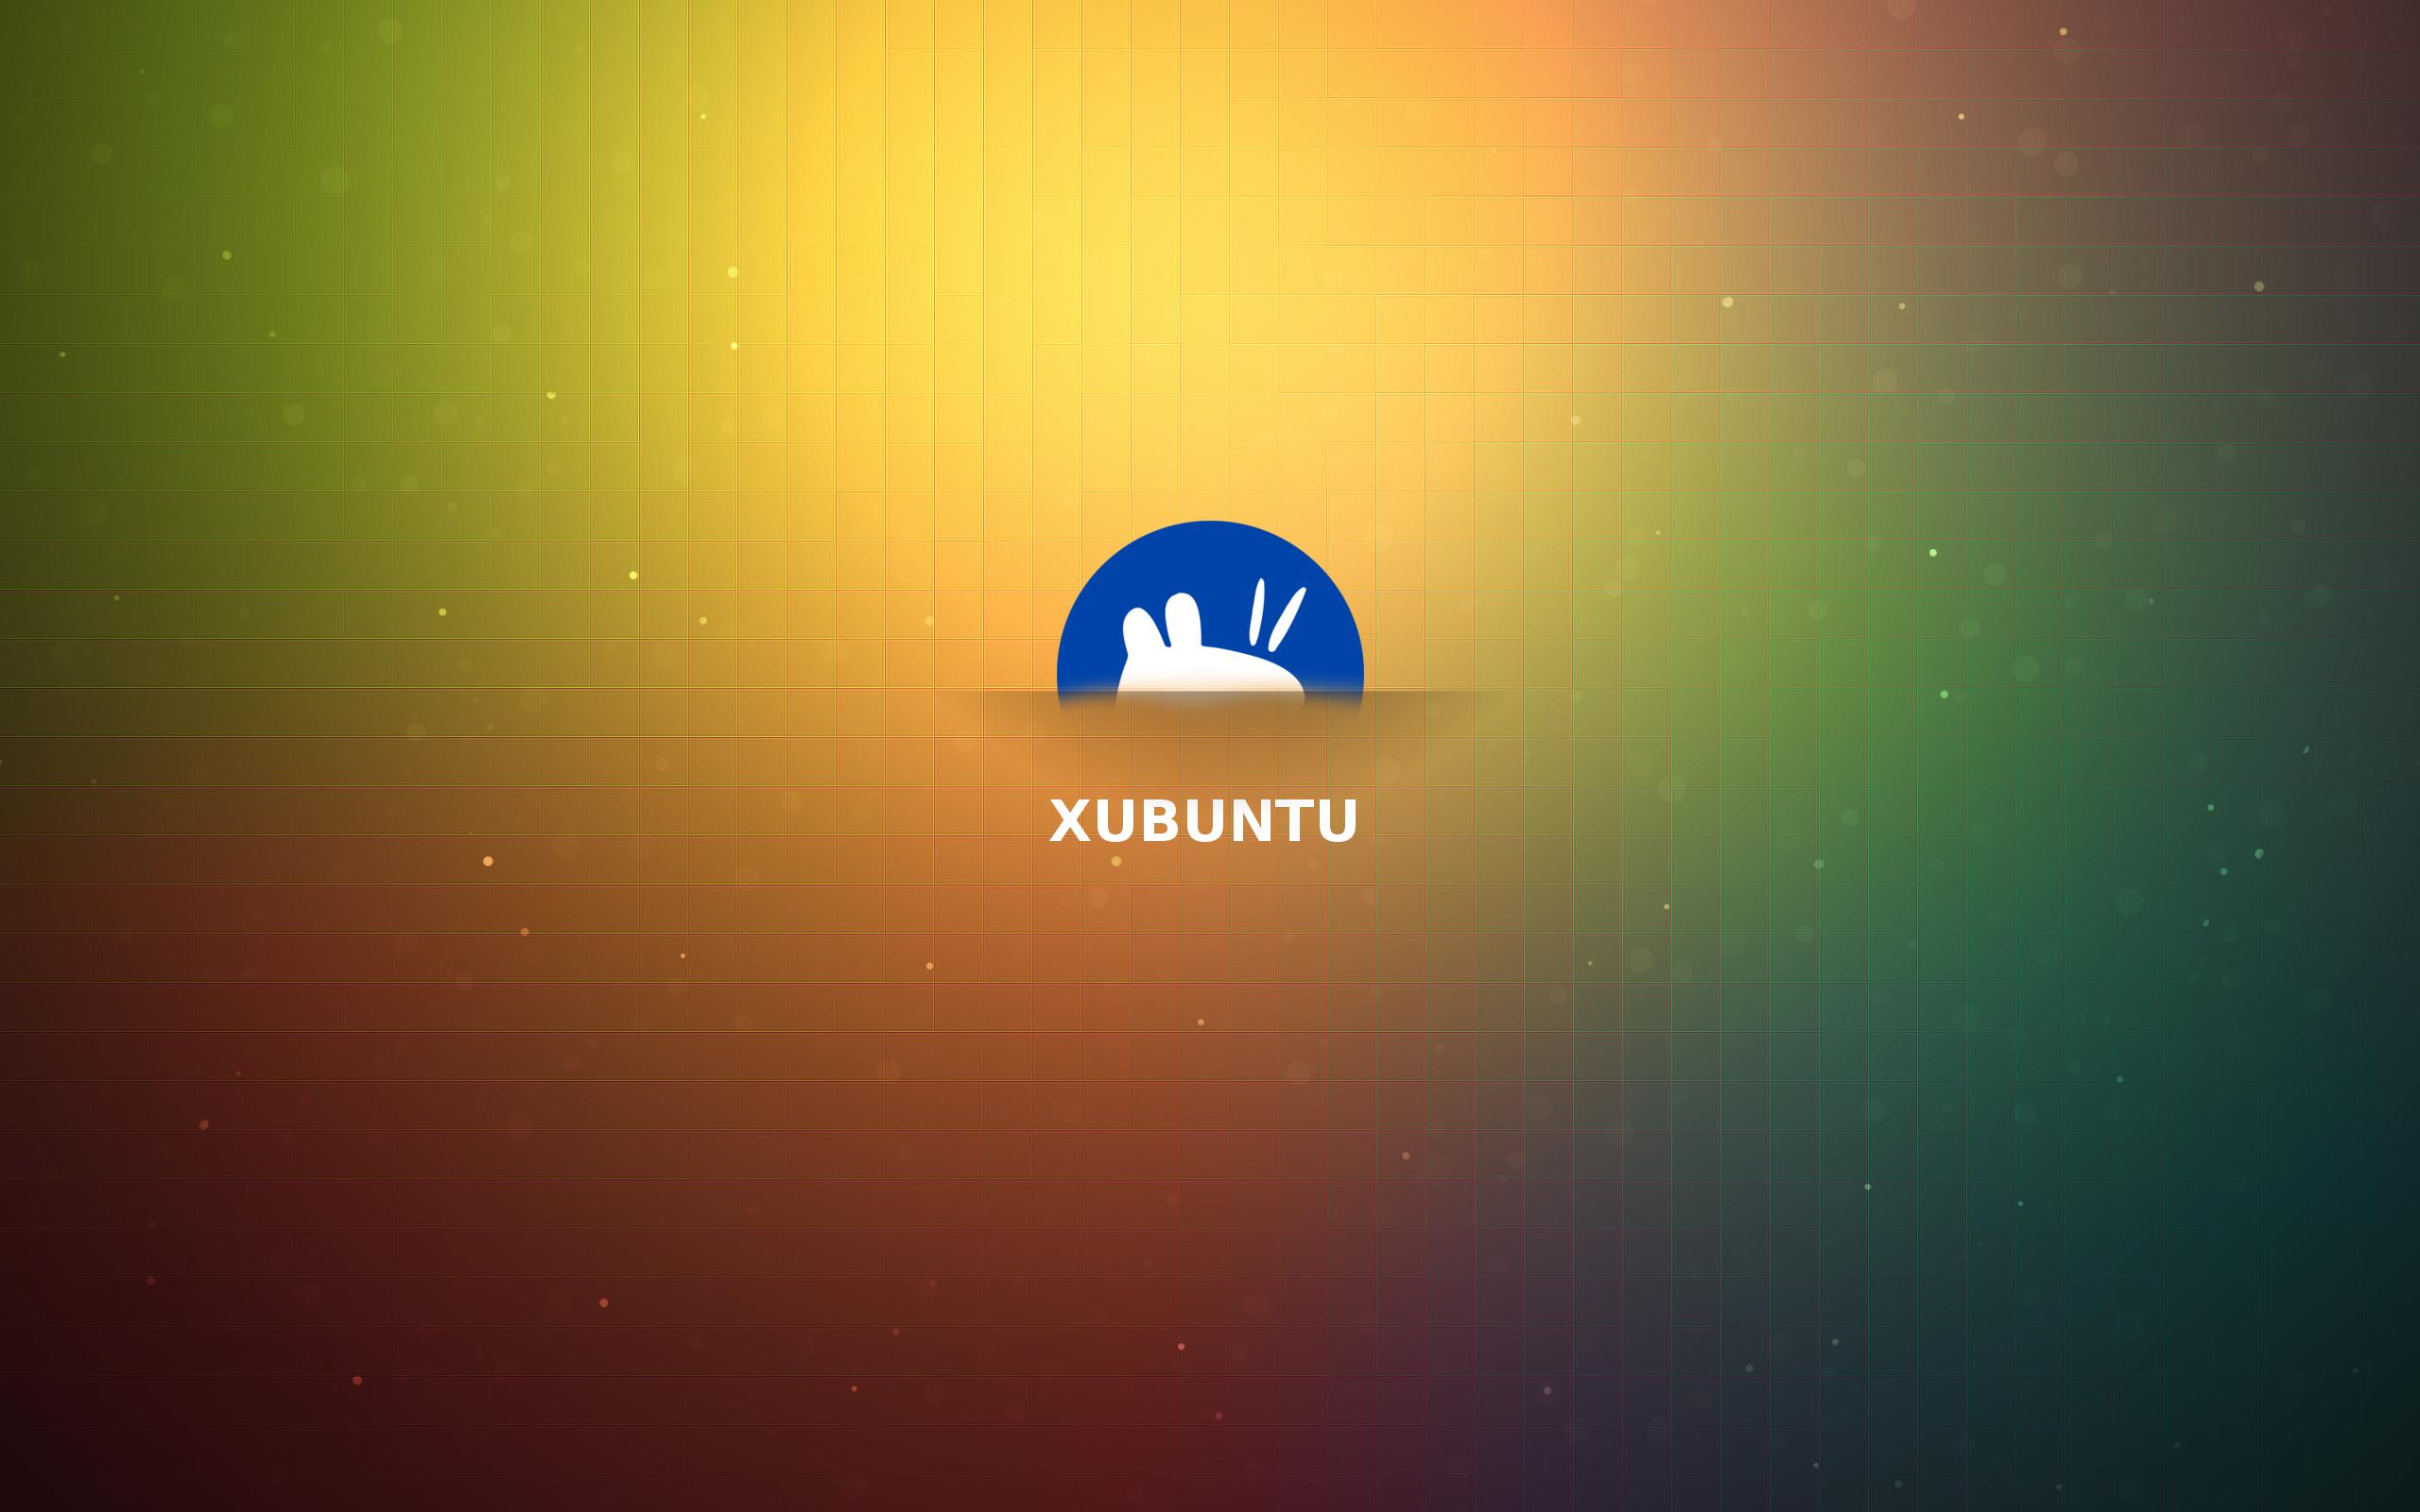 Xubuntu up galaxy